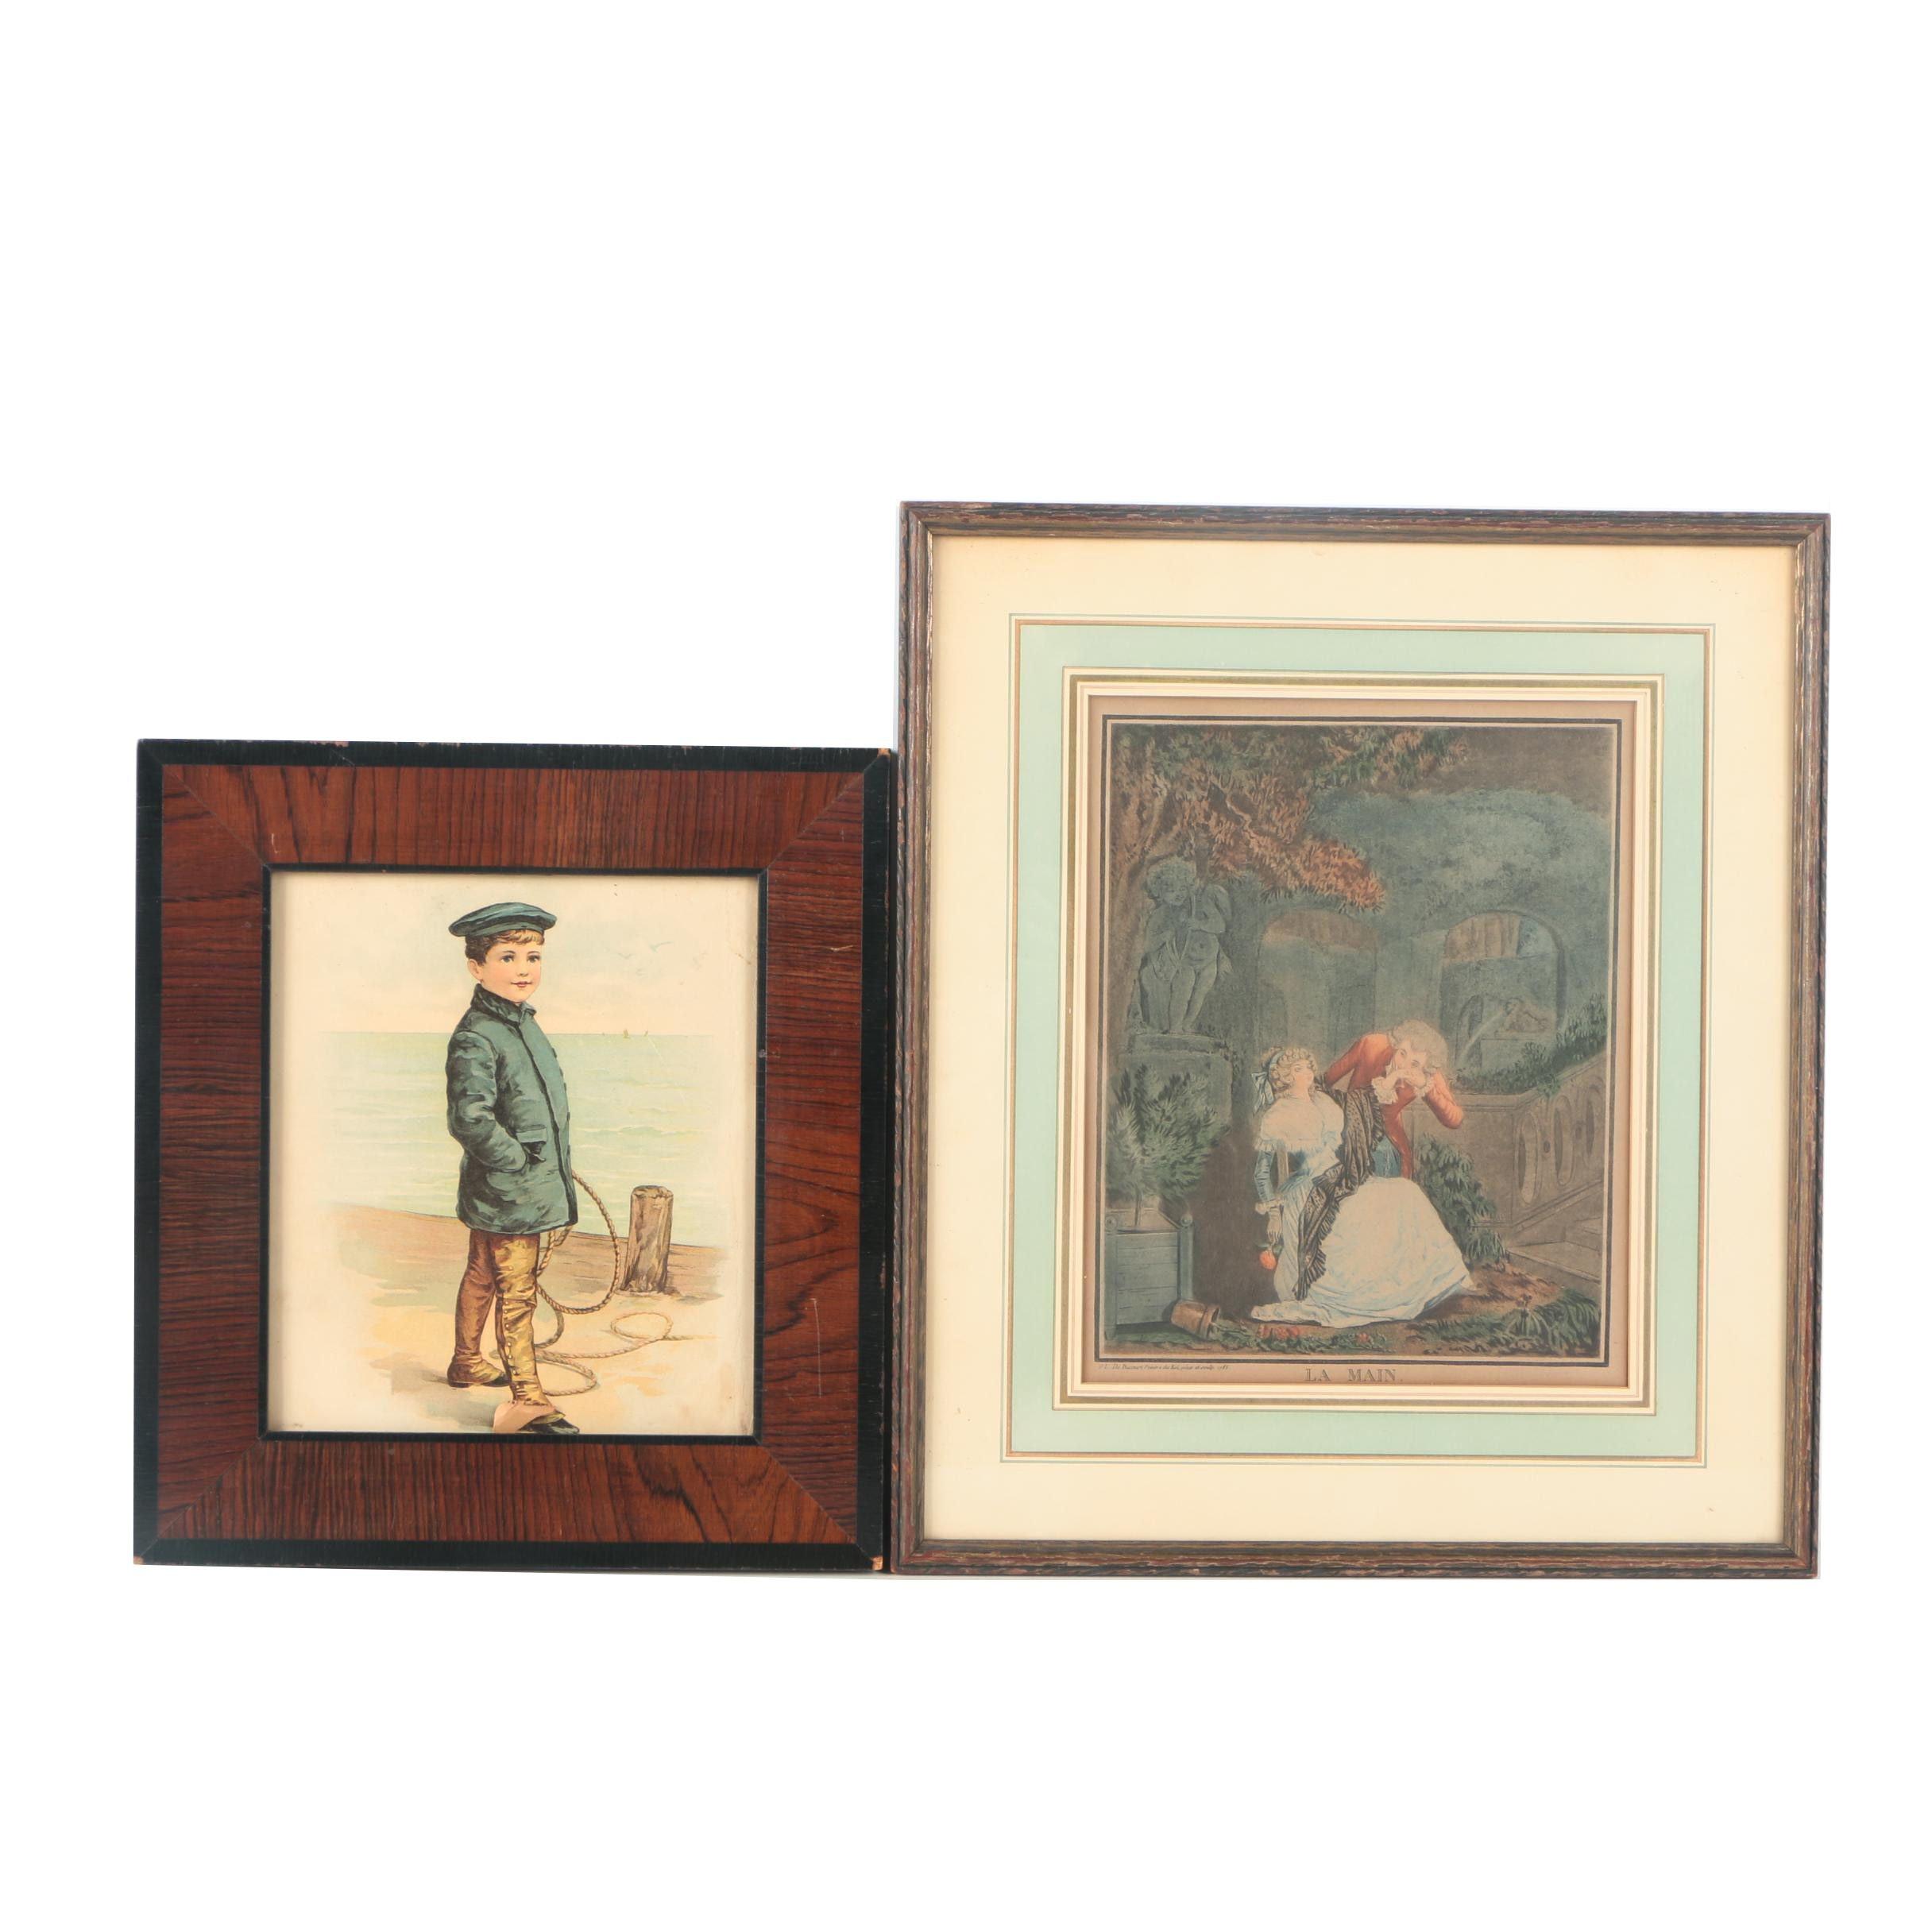 Assortment of Antique Prints